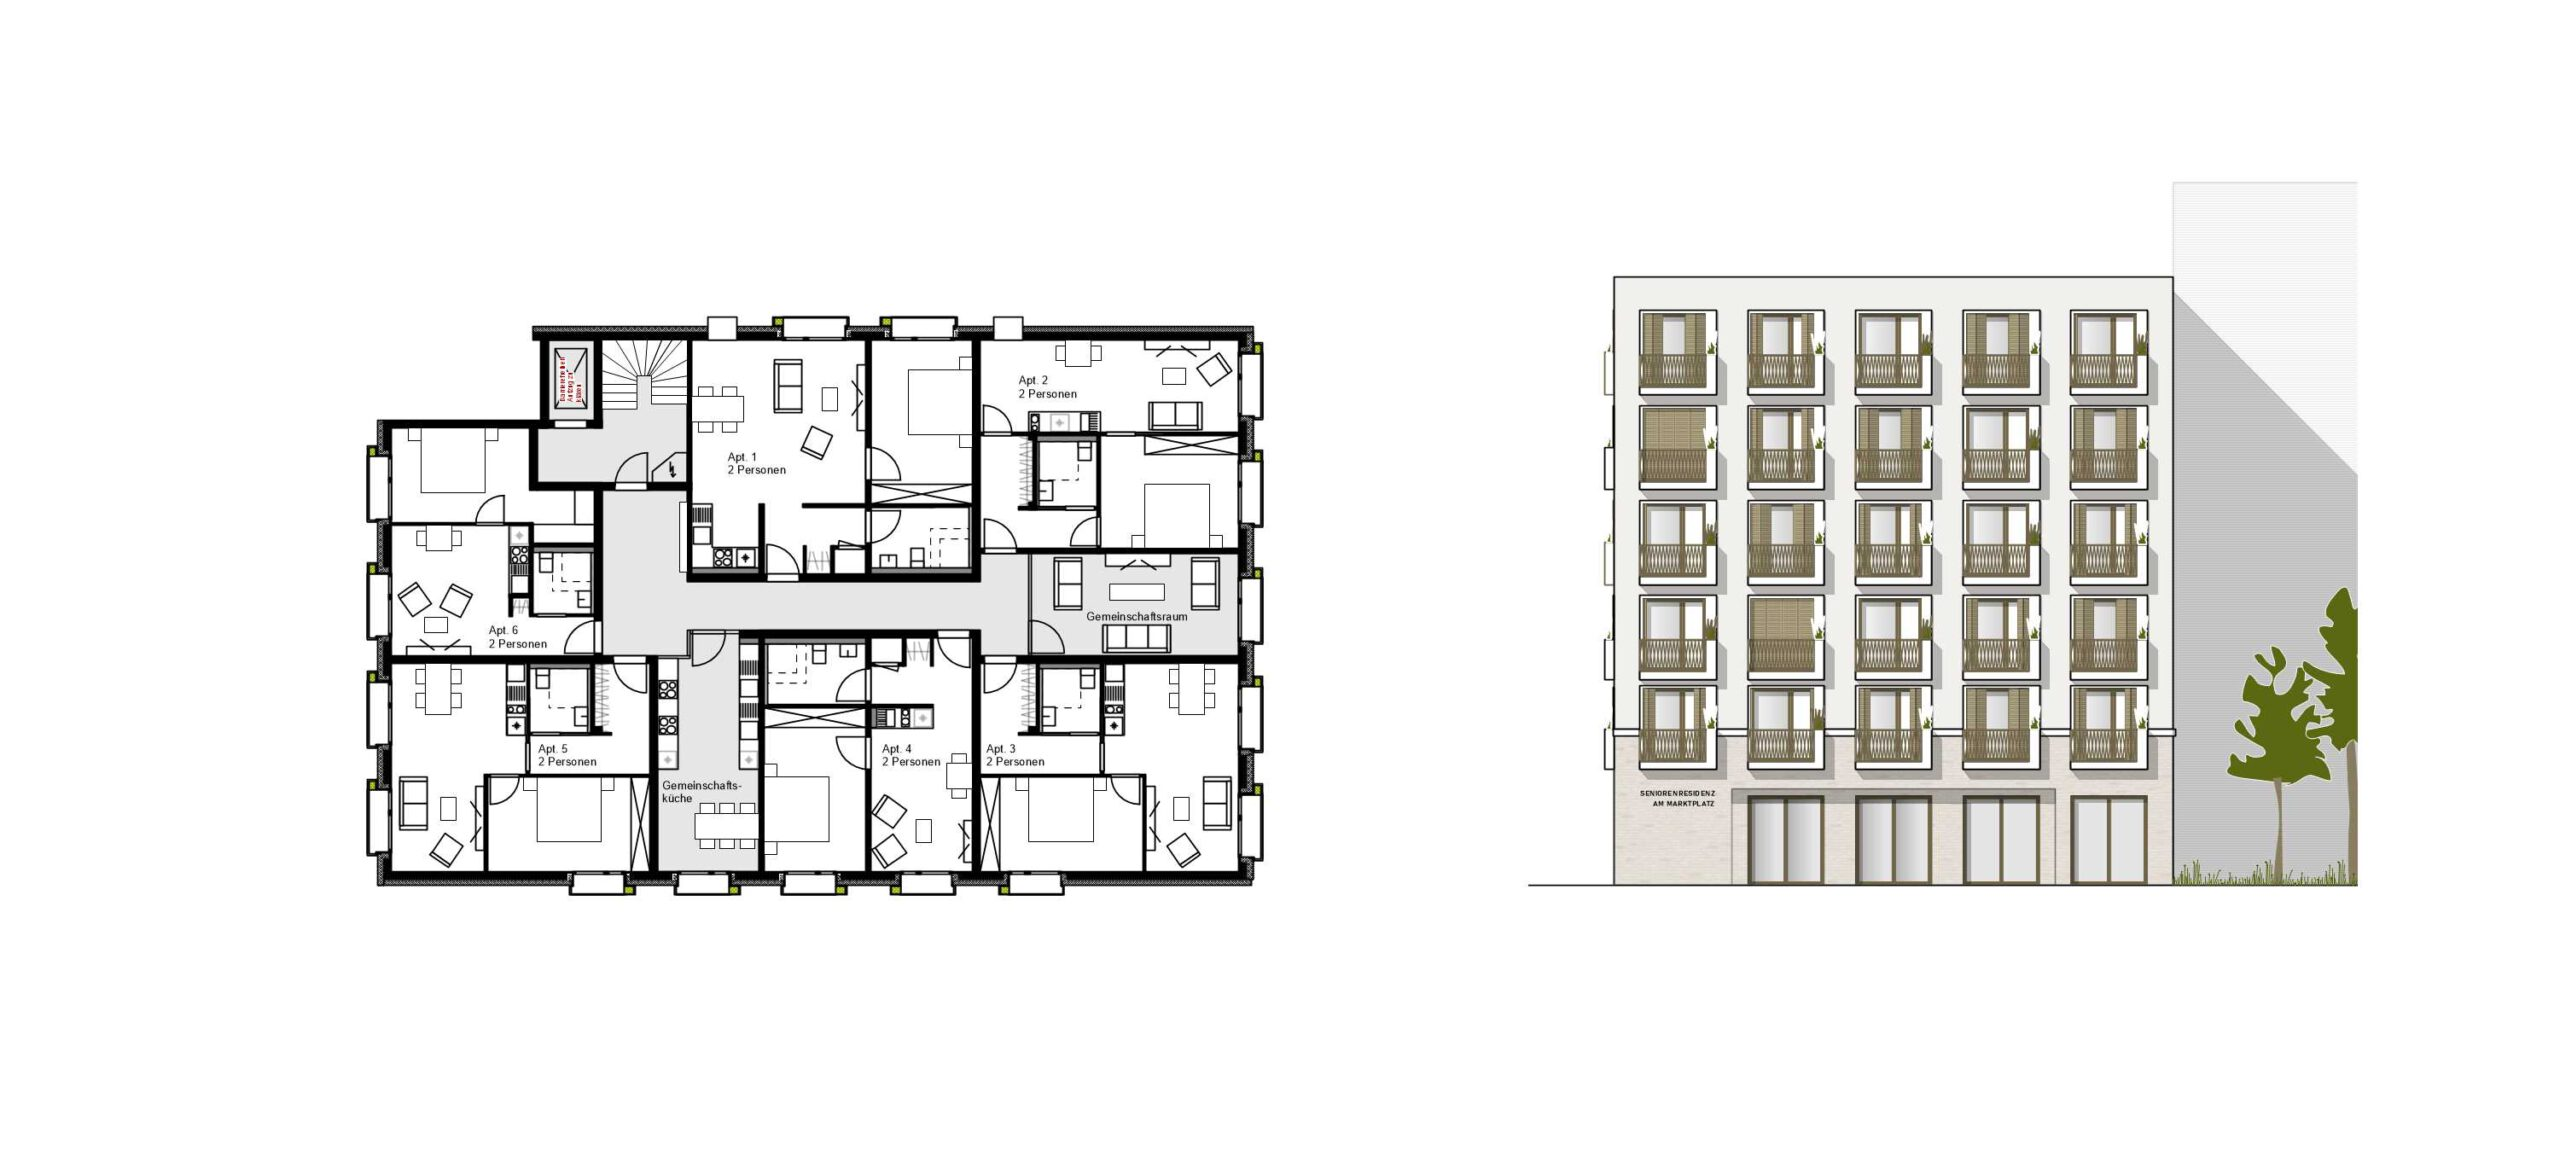 Projekt 377 Avrilléstraße Marktplatz Schwalbach Grundriss Regelgeschoss Senioren FFM-ARCHITEKTEN